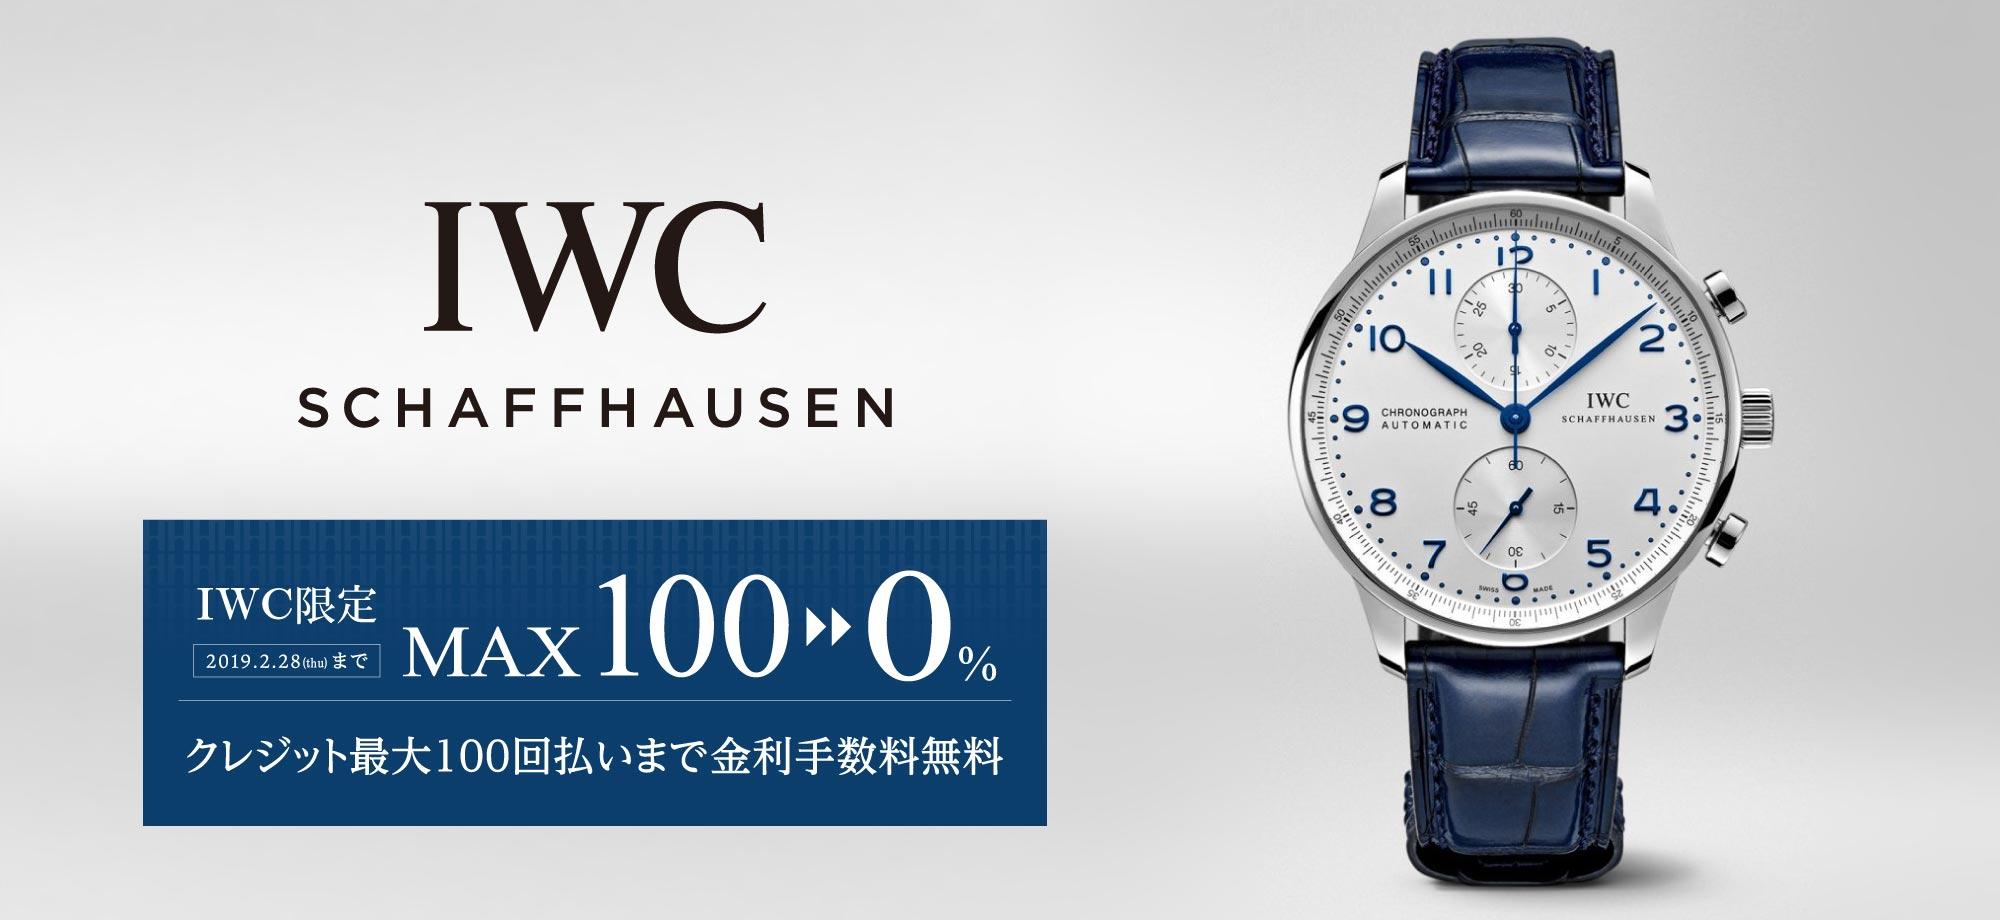 HASSIN_web_IWC201901_2000_920